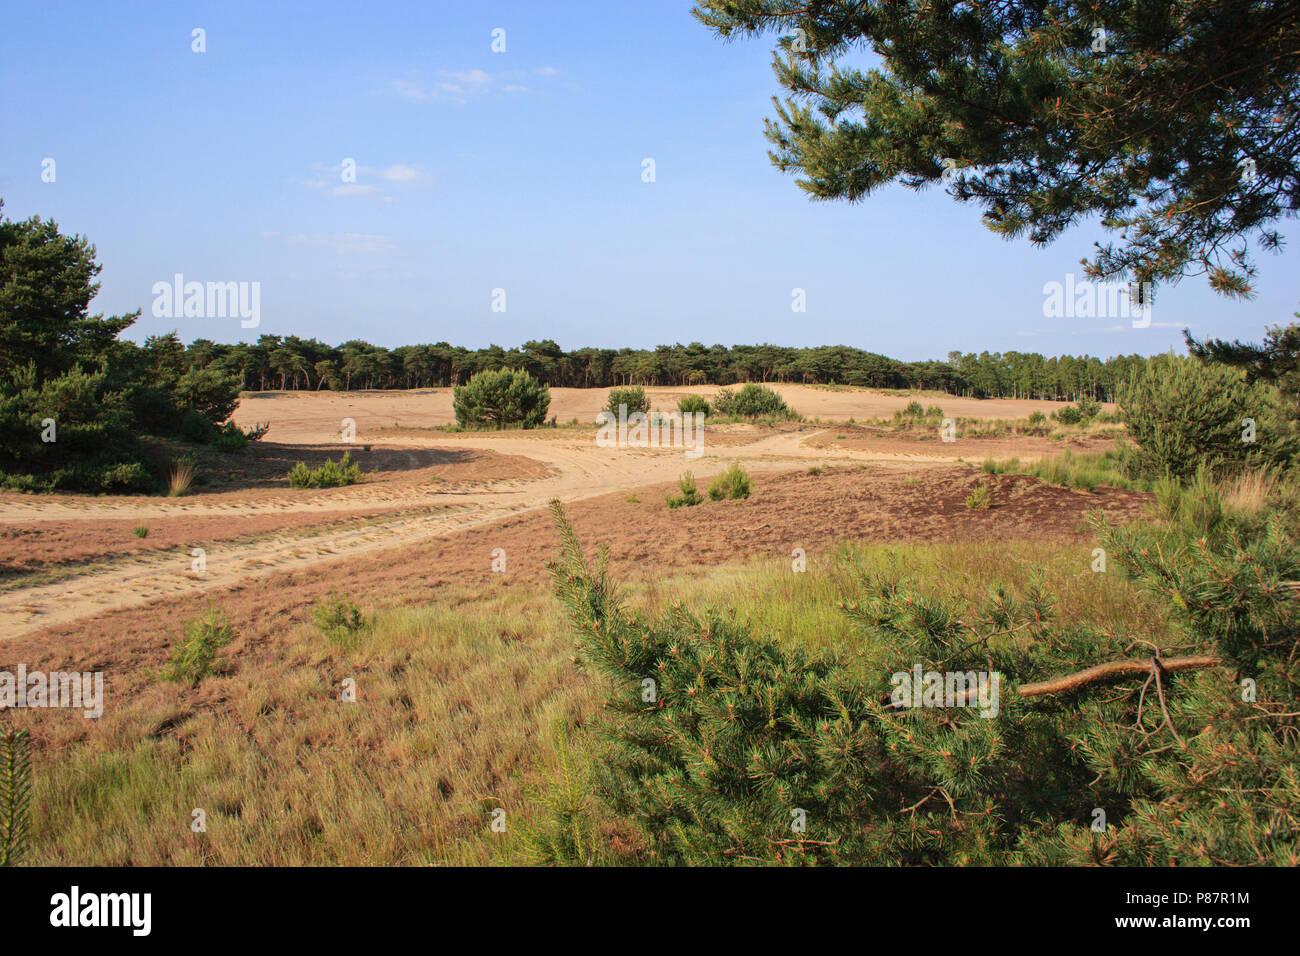 Stuifzand, zand, heide en naaldbomen op militair terrein en Natura 2000 gebied de Boshoverheide. Drift-sand heathland and pines at militairy terrain a - Stock Image